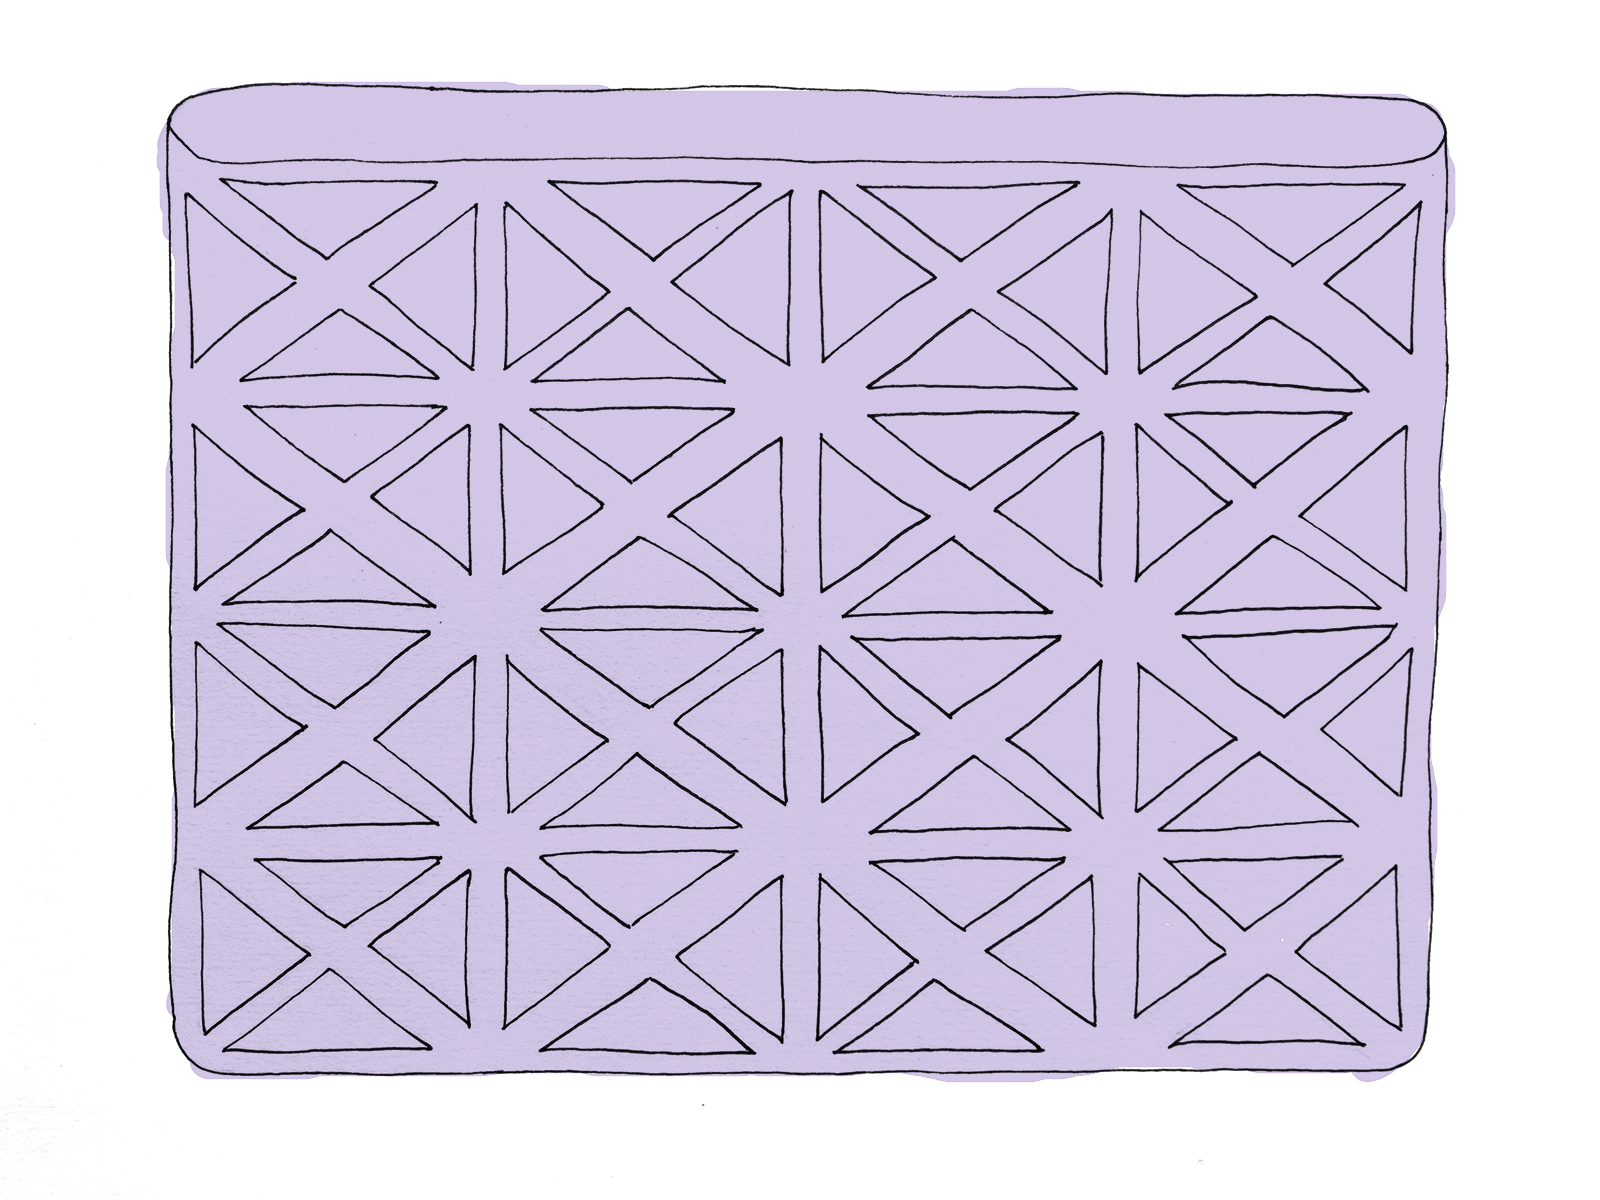 Stellate-cowl-schematic-(colour).jpg